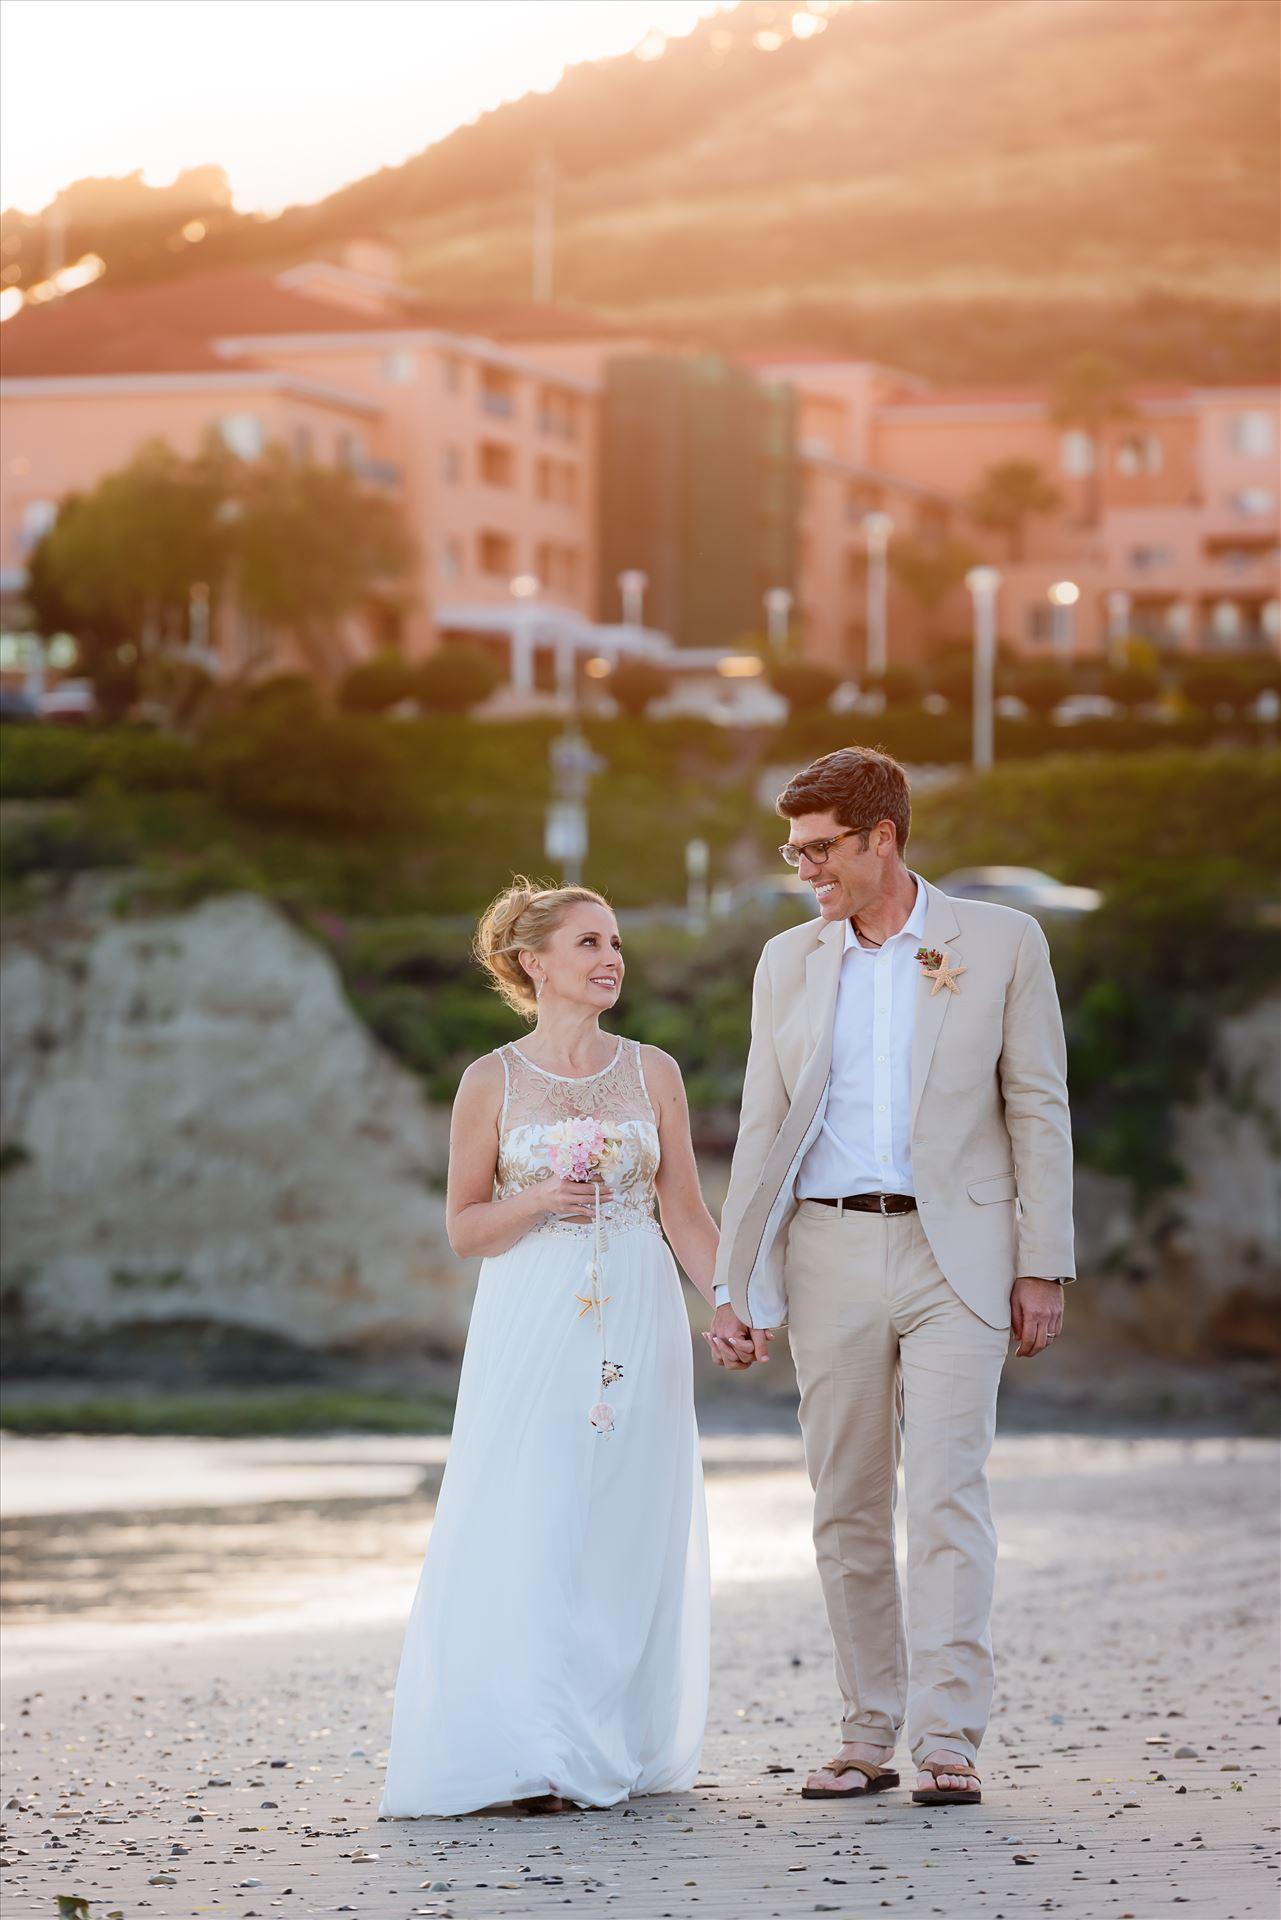 Ross Beach Wedding 04  by Sarah Williams